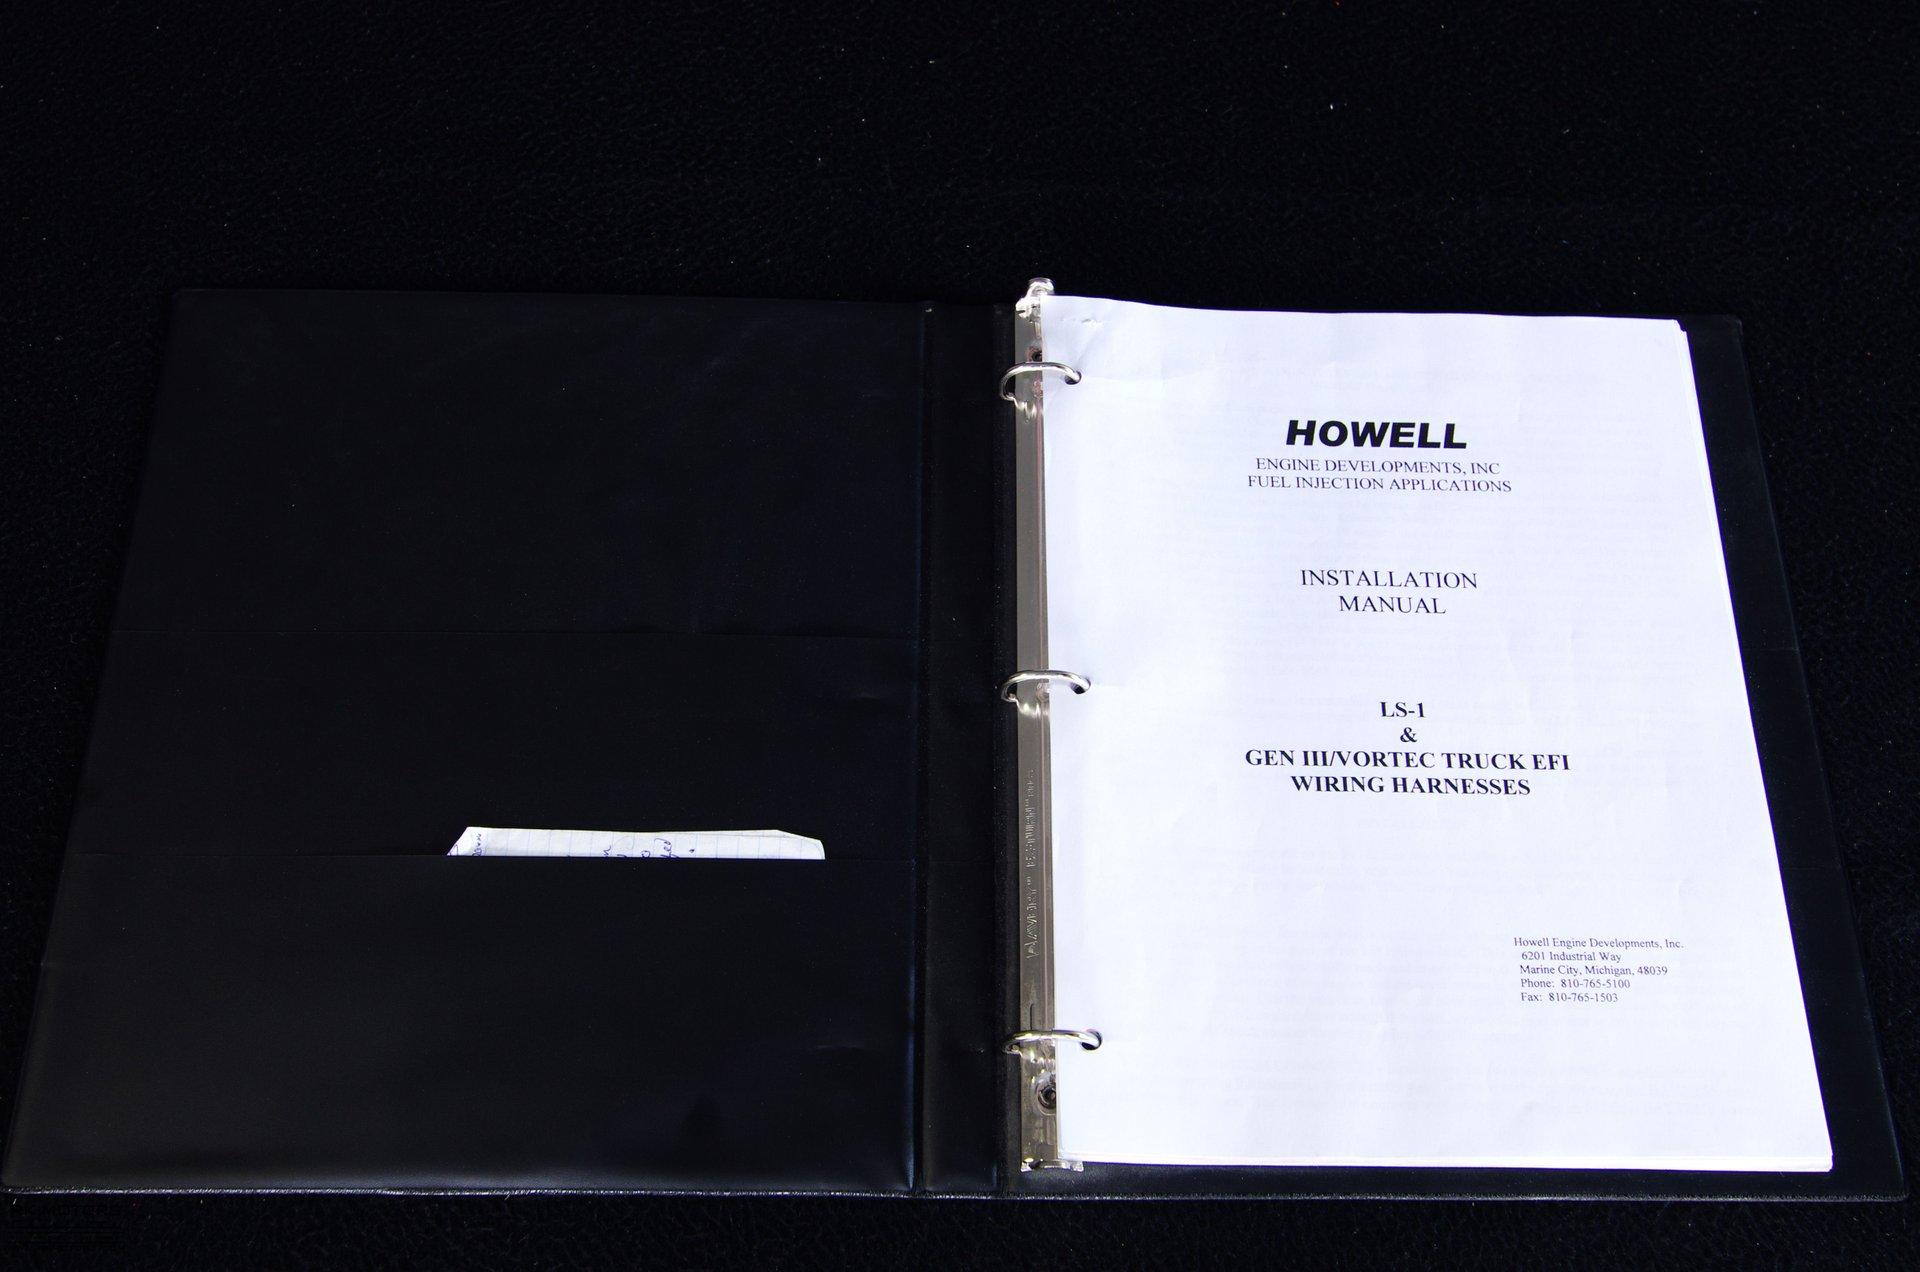 Howell Industries Wiring Harness | Best Wiring Liry on holtz industries, michigan industries, washington industries, sterling industries, clinton industries,